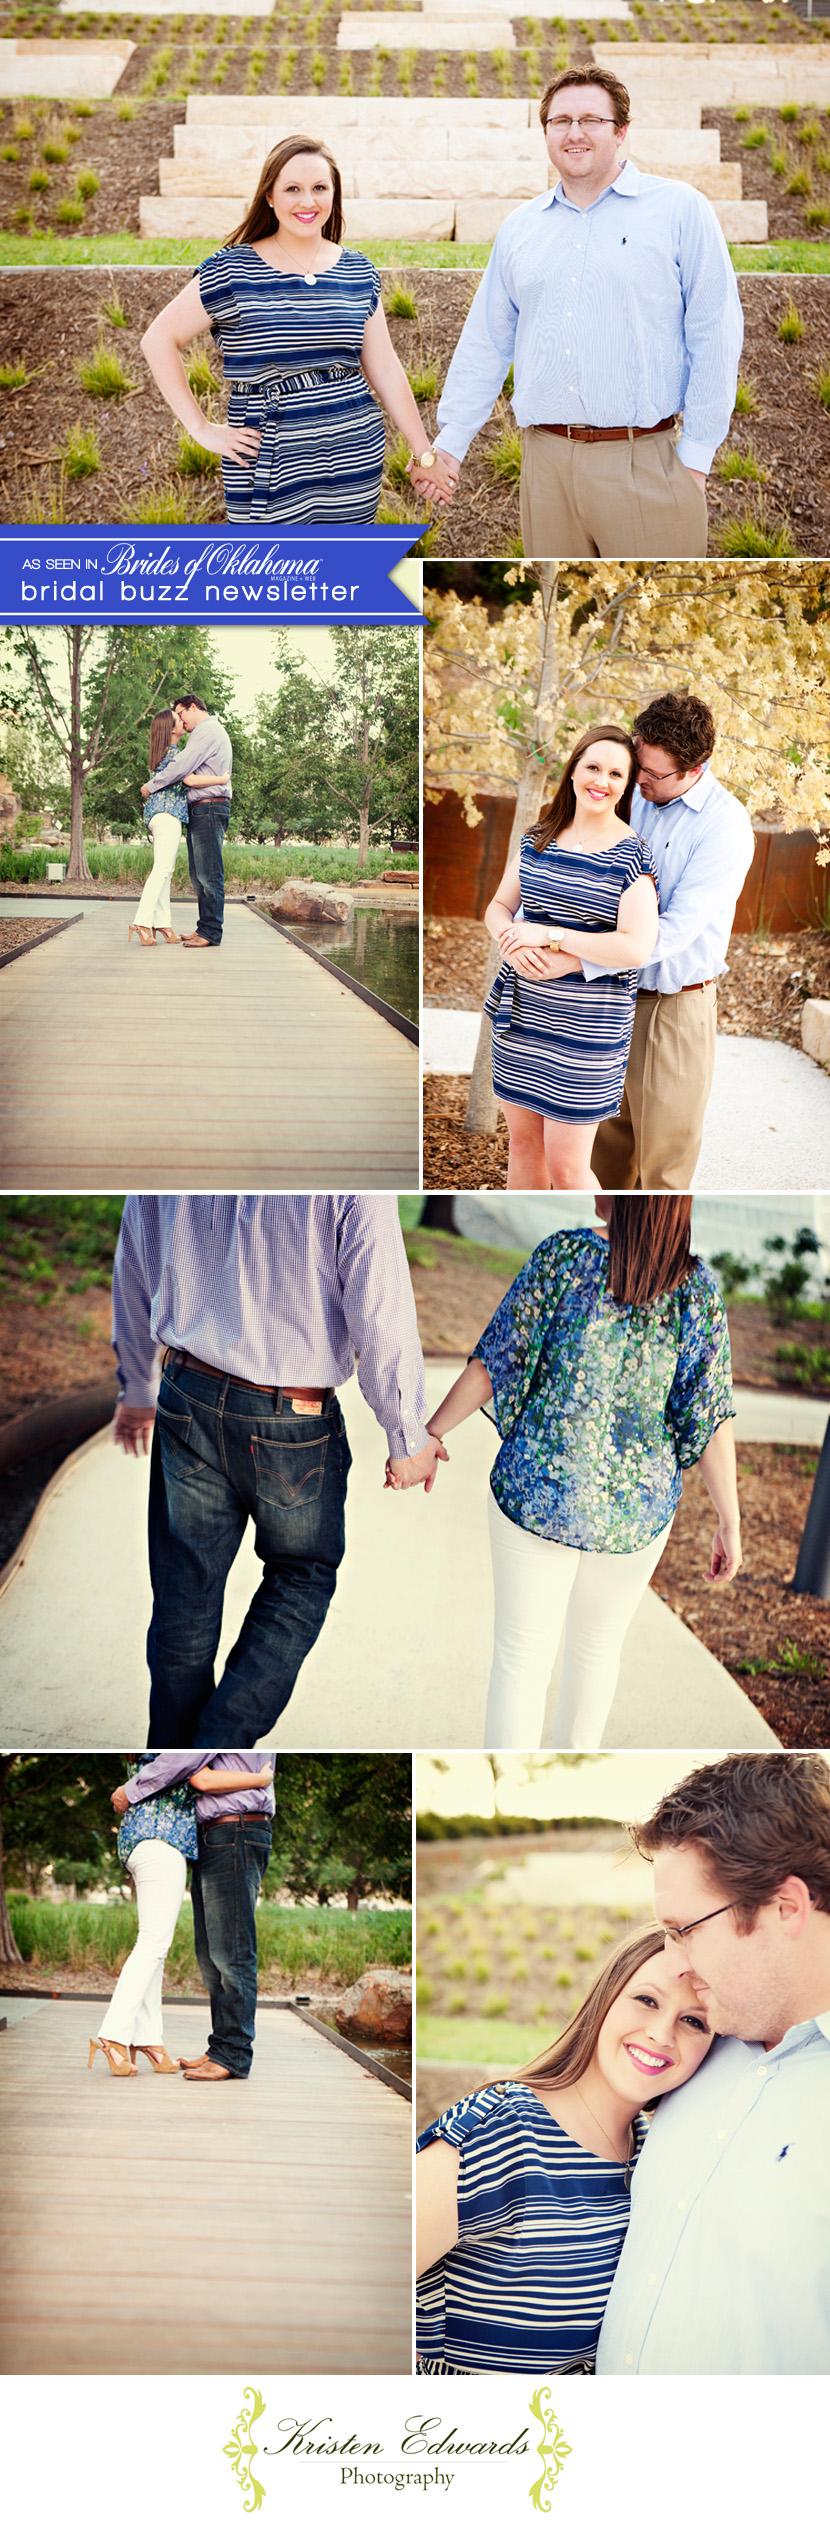 Kristen_Edwards_Almost_Married_Blog